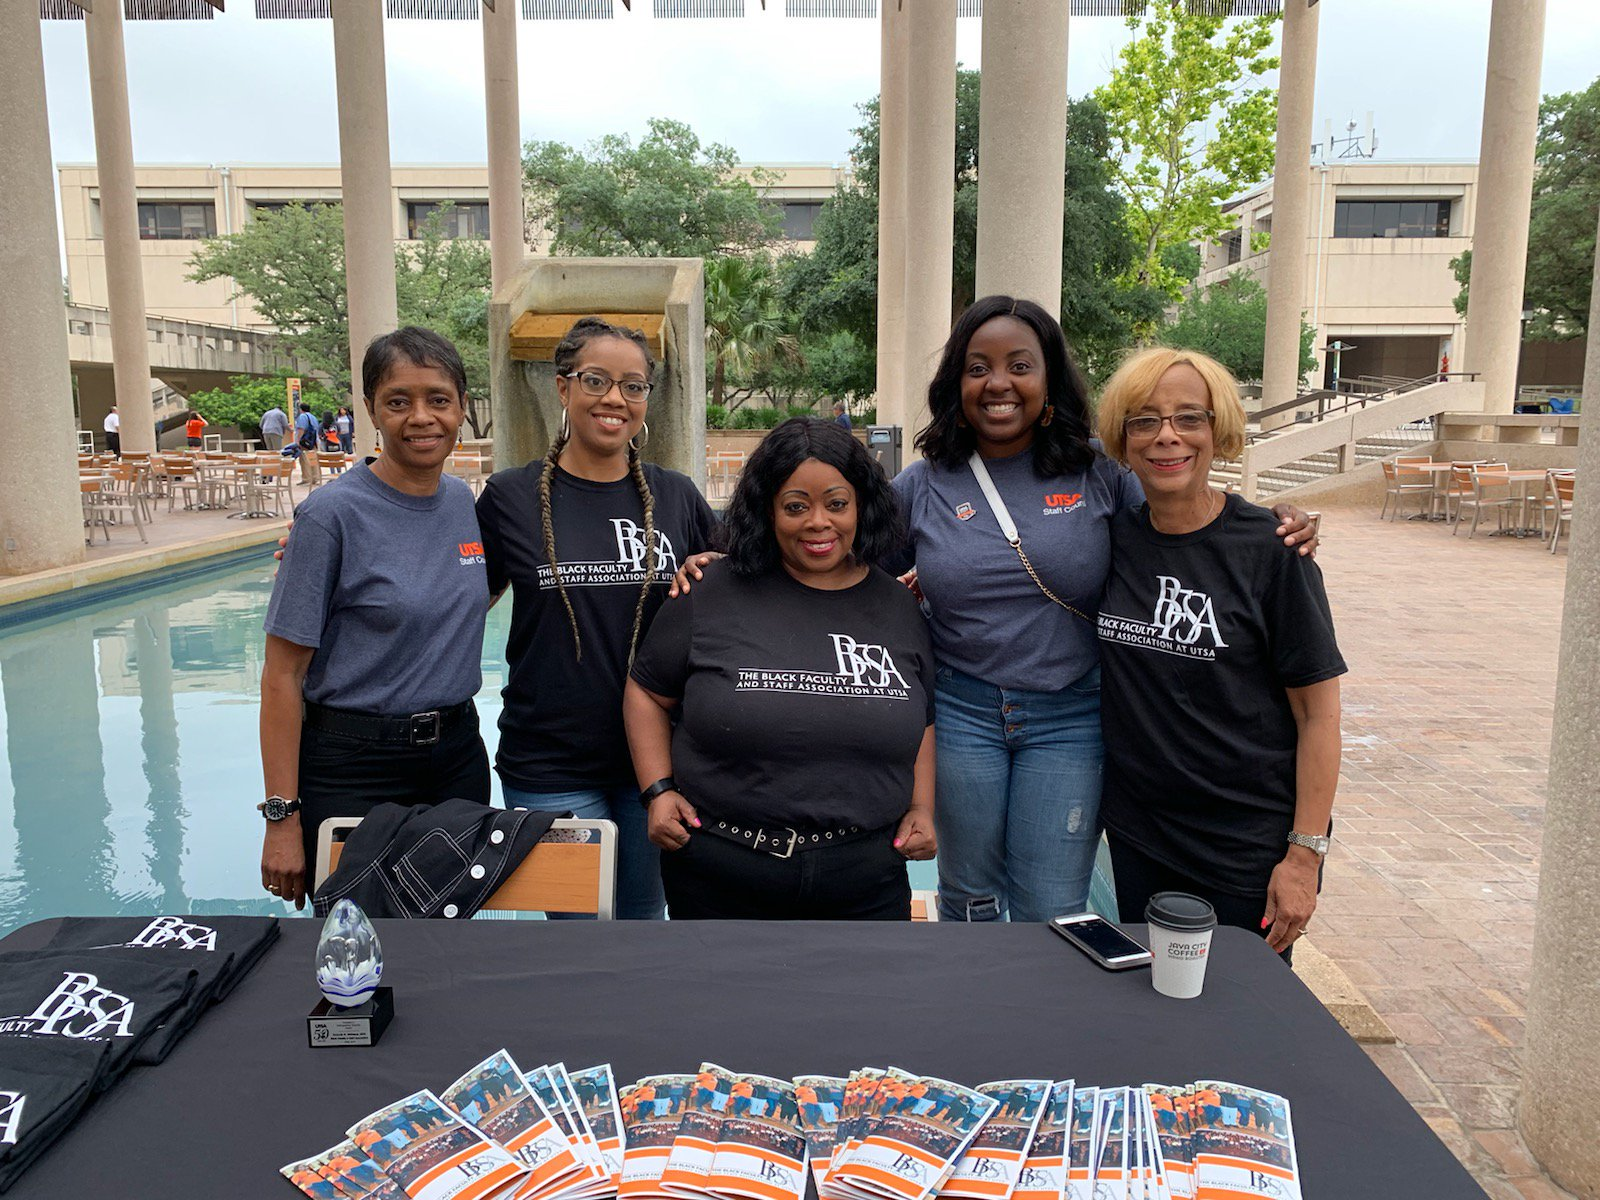 BFSA at greater staff appreciation event